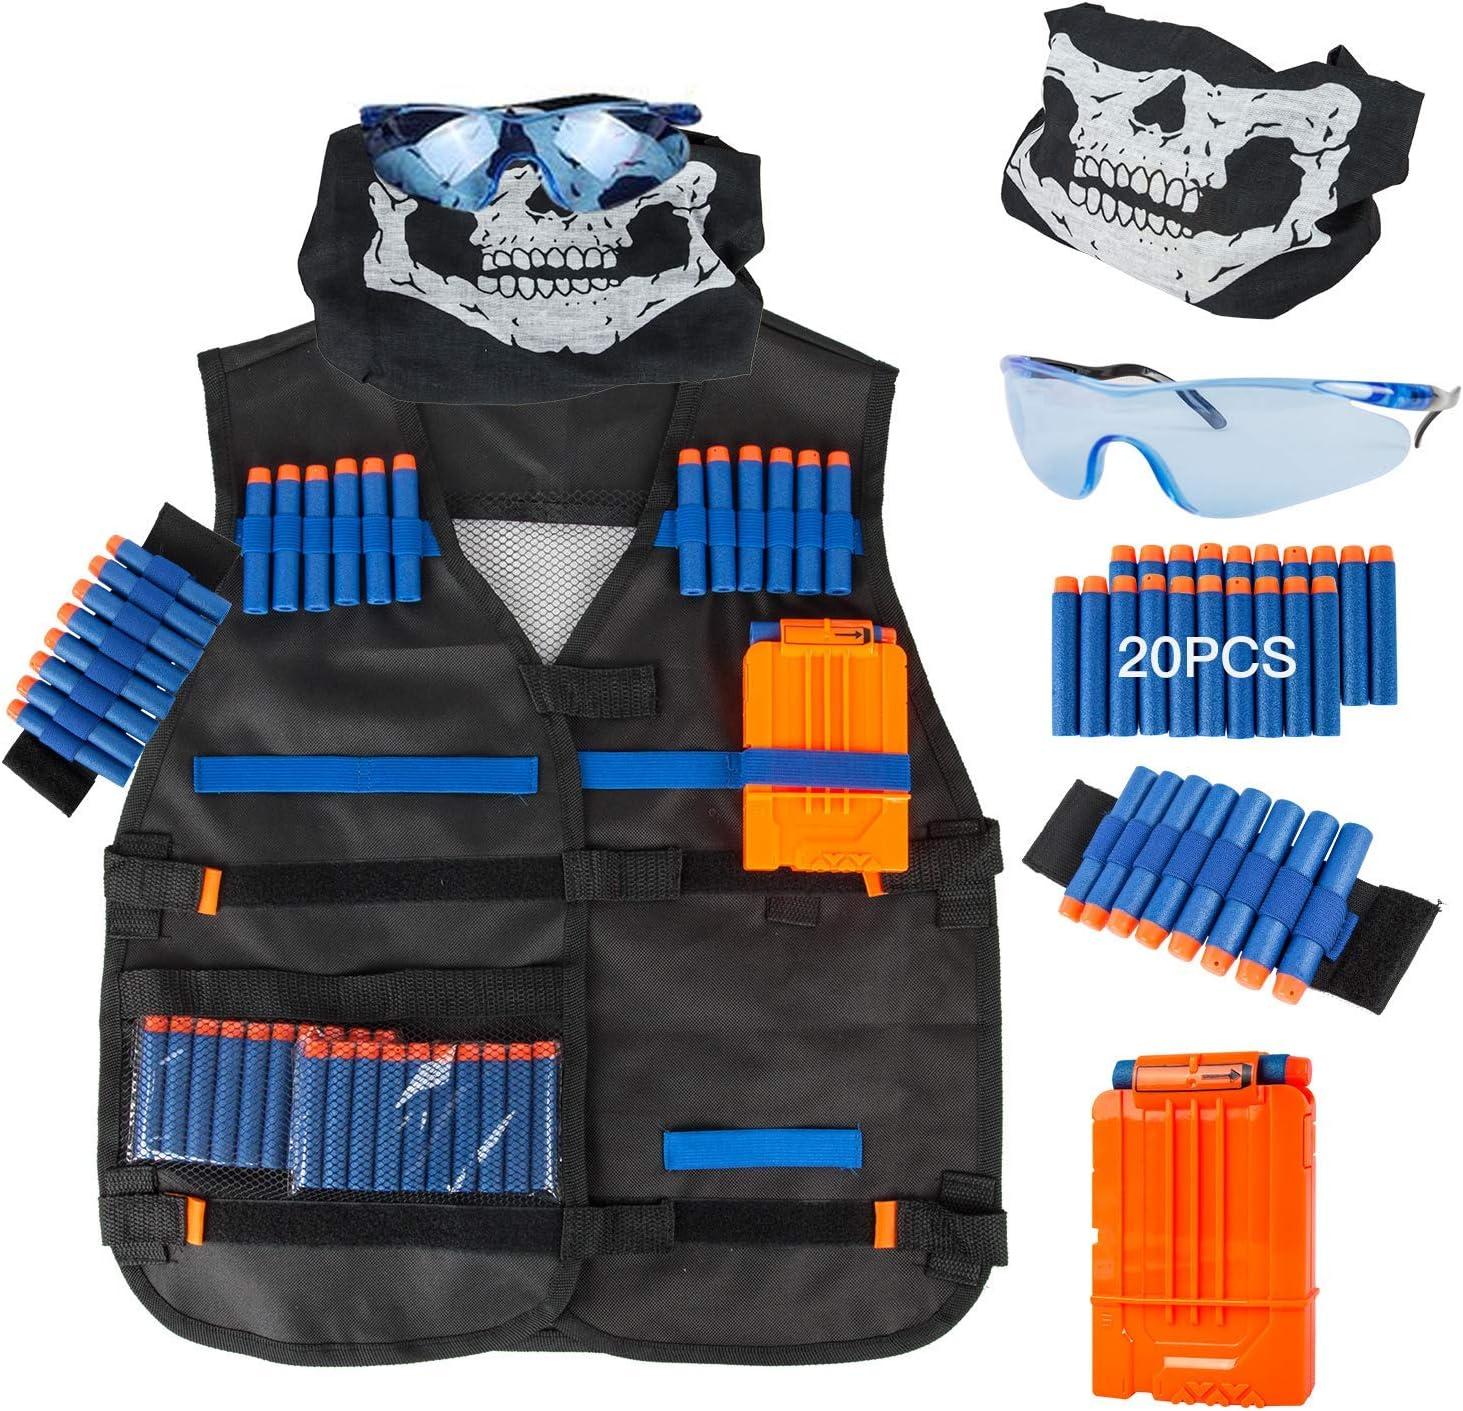 Kit de chaleco t/áctico para ni/ños para Nerf Guns N-Strike Elite Series con recarga de dardos bolsa de dardos mu/ñequera y gafas protectoras para ni/ños clip de recarga m/áscara t/áctica